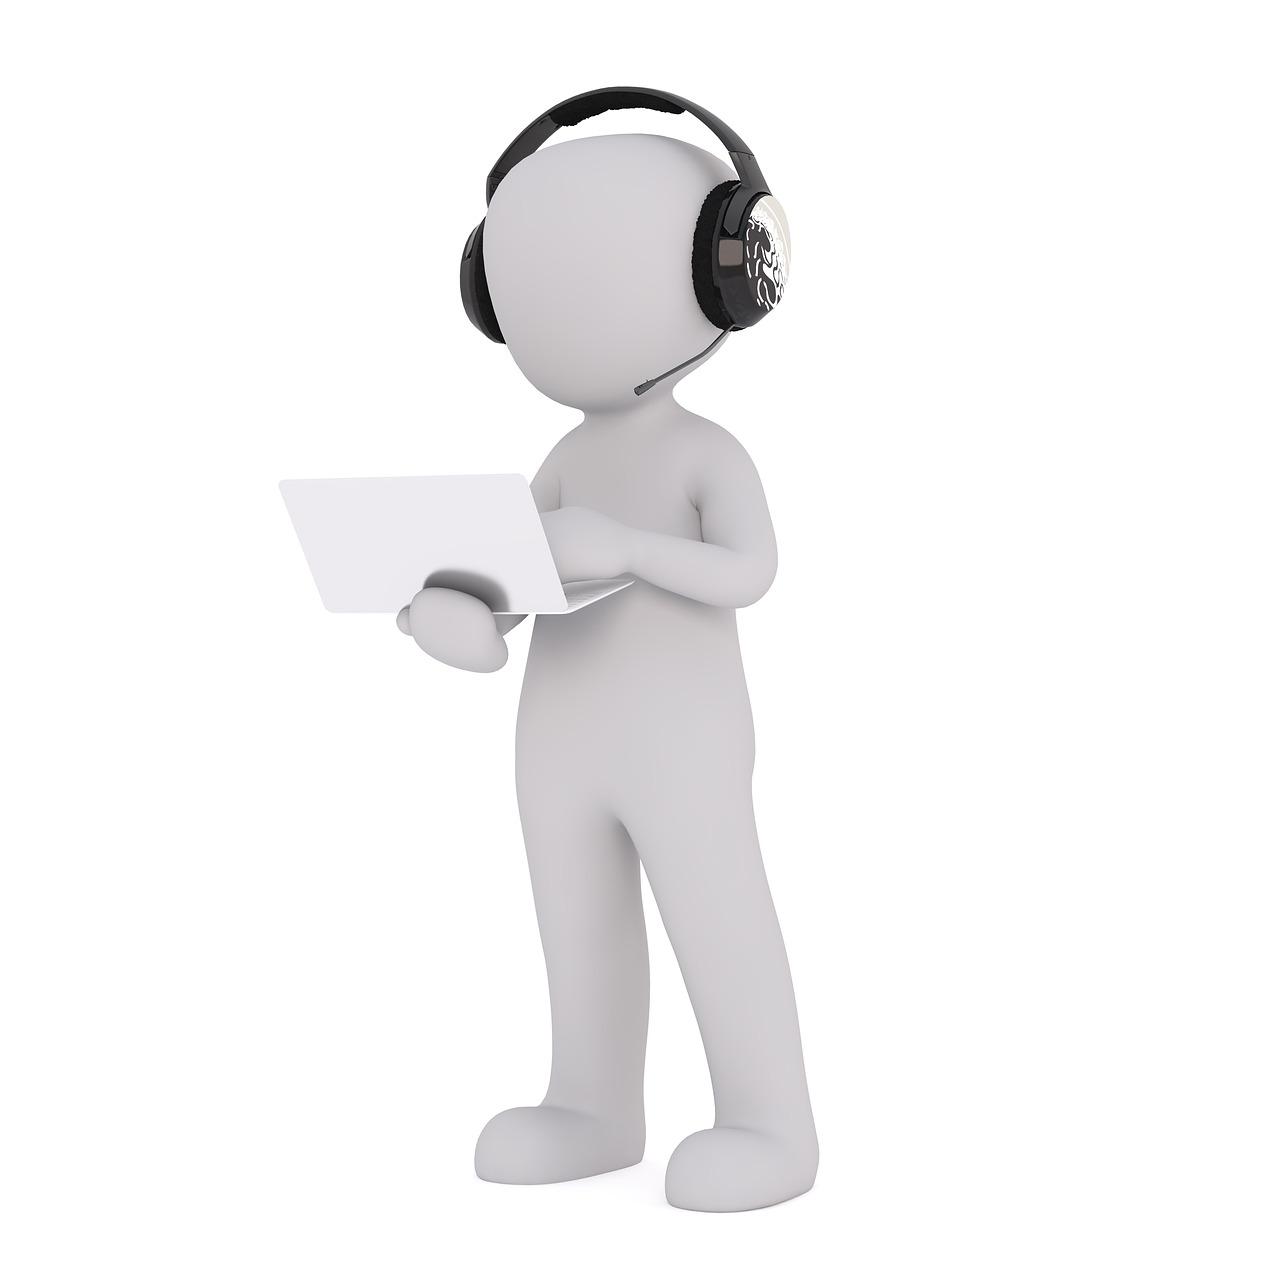 Parametry słuchawek do pracy